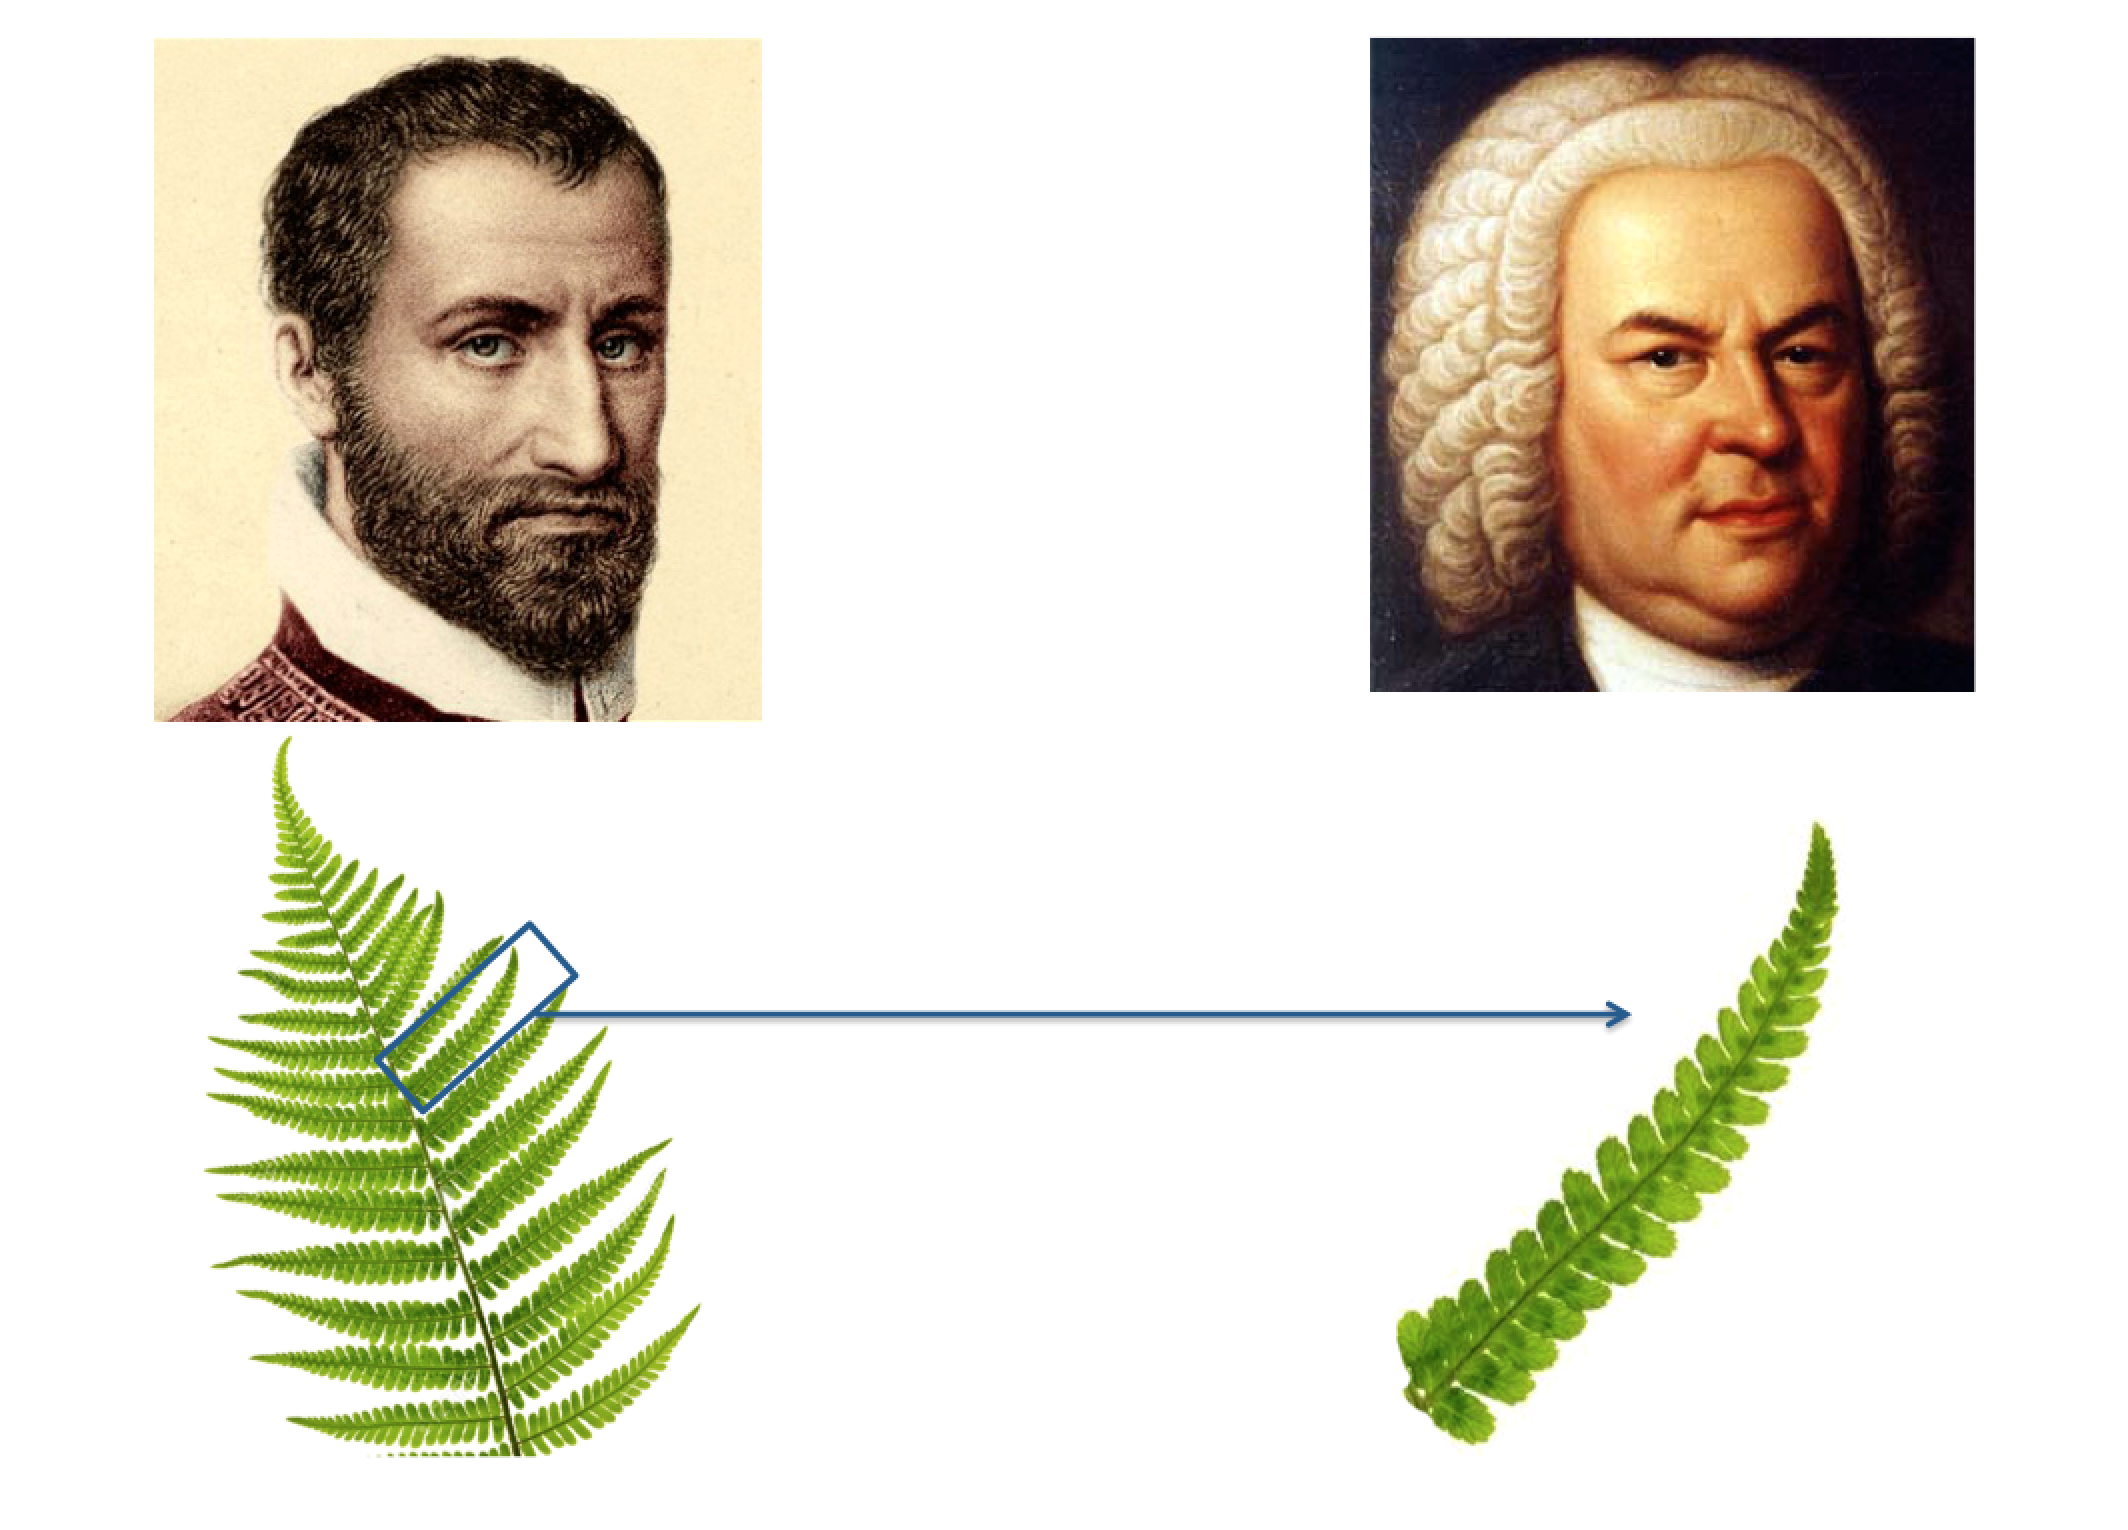 Palestrina Bach fern